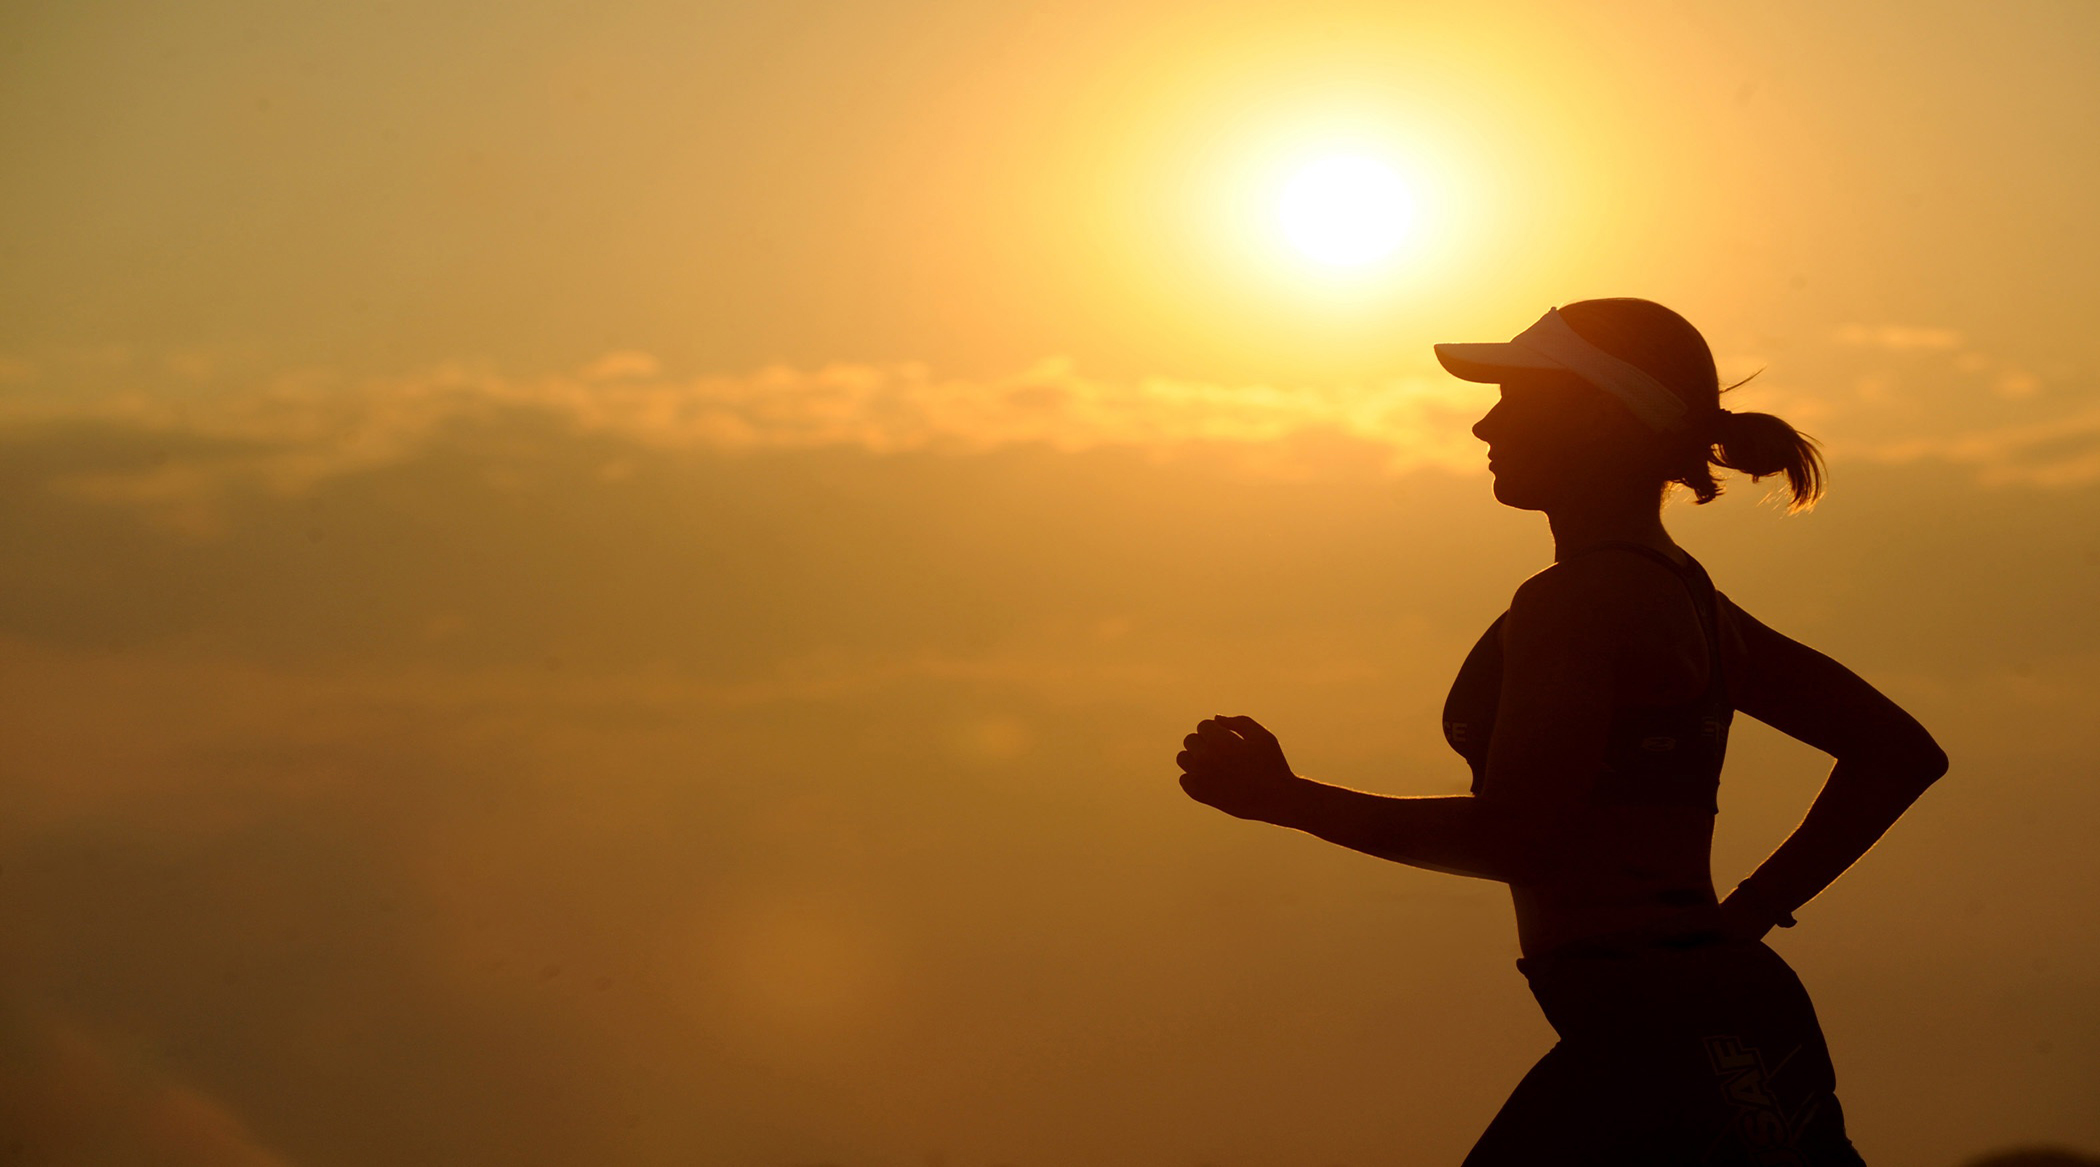 running-runner-long-distance-fitness-407512.jpg